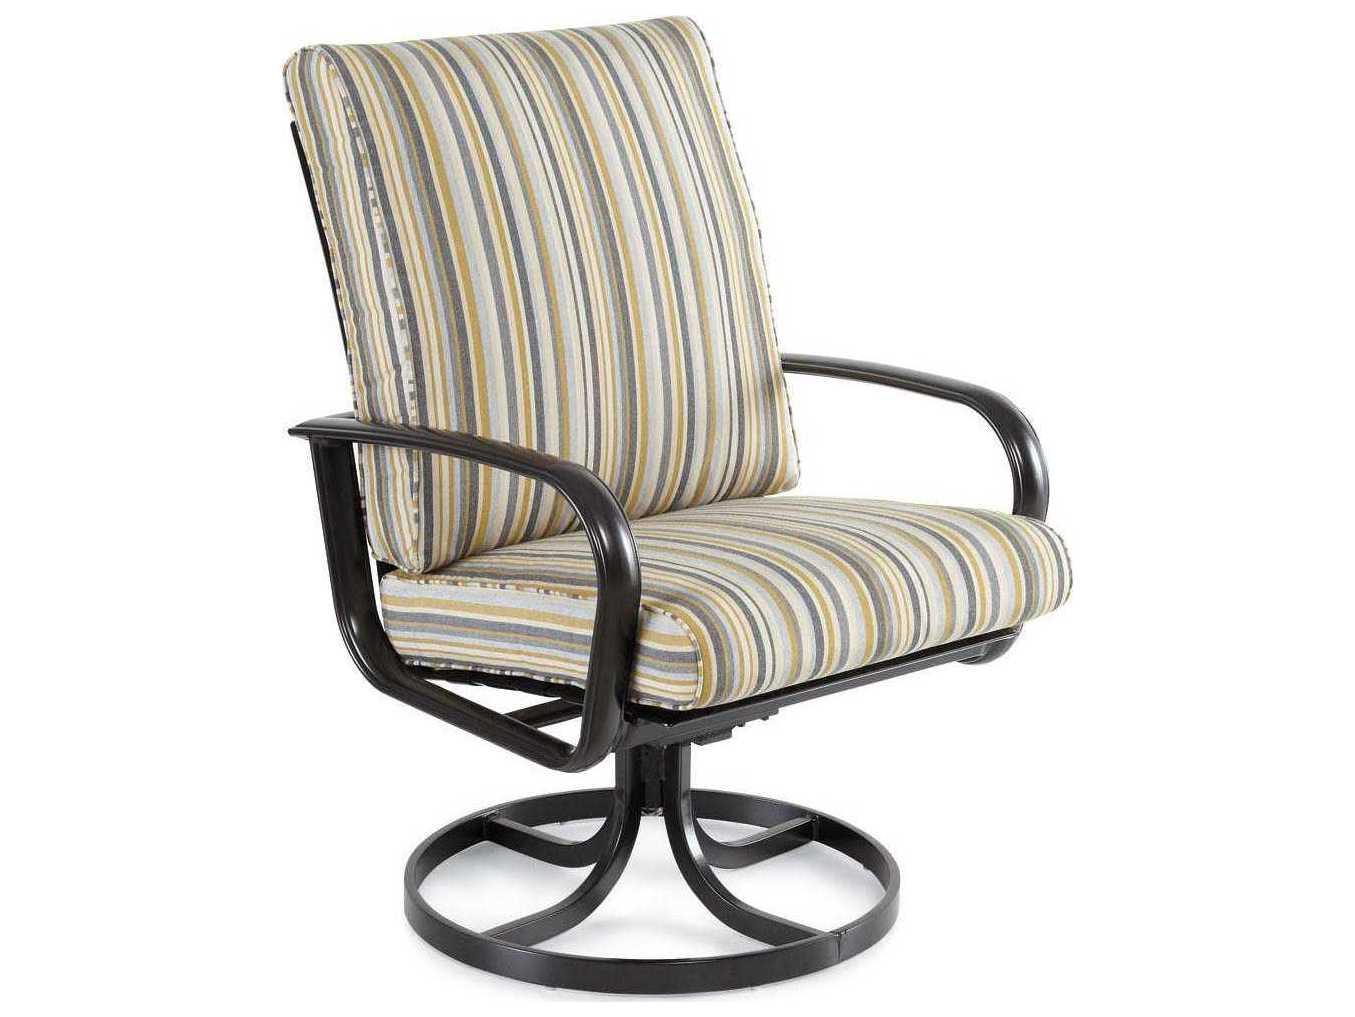 Winston Savoy Cushion Aluminum High Back Swivel Tilt